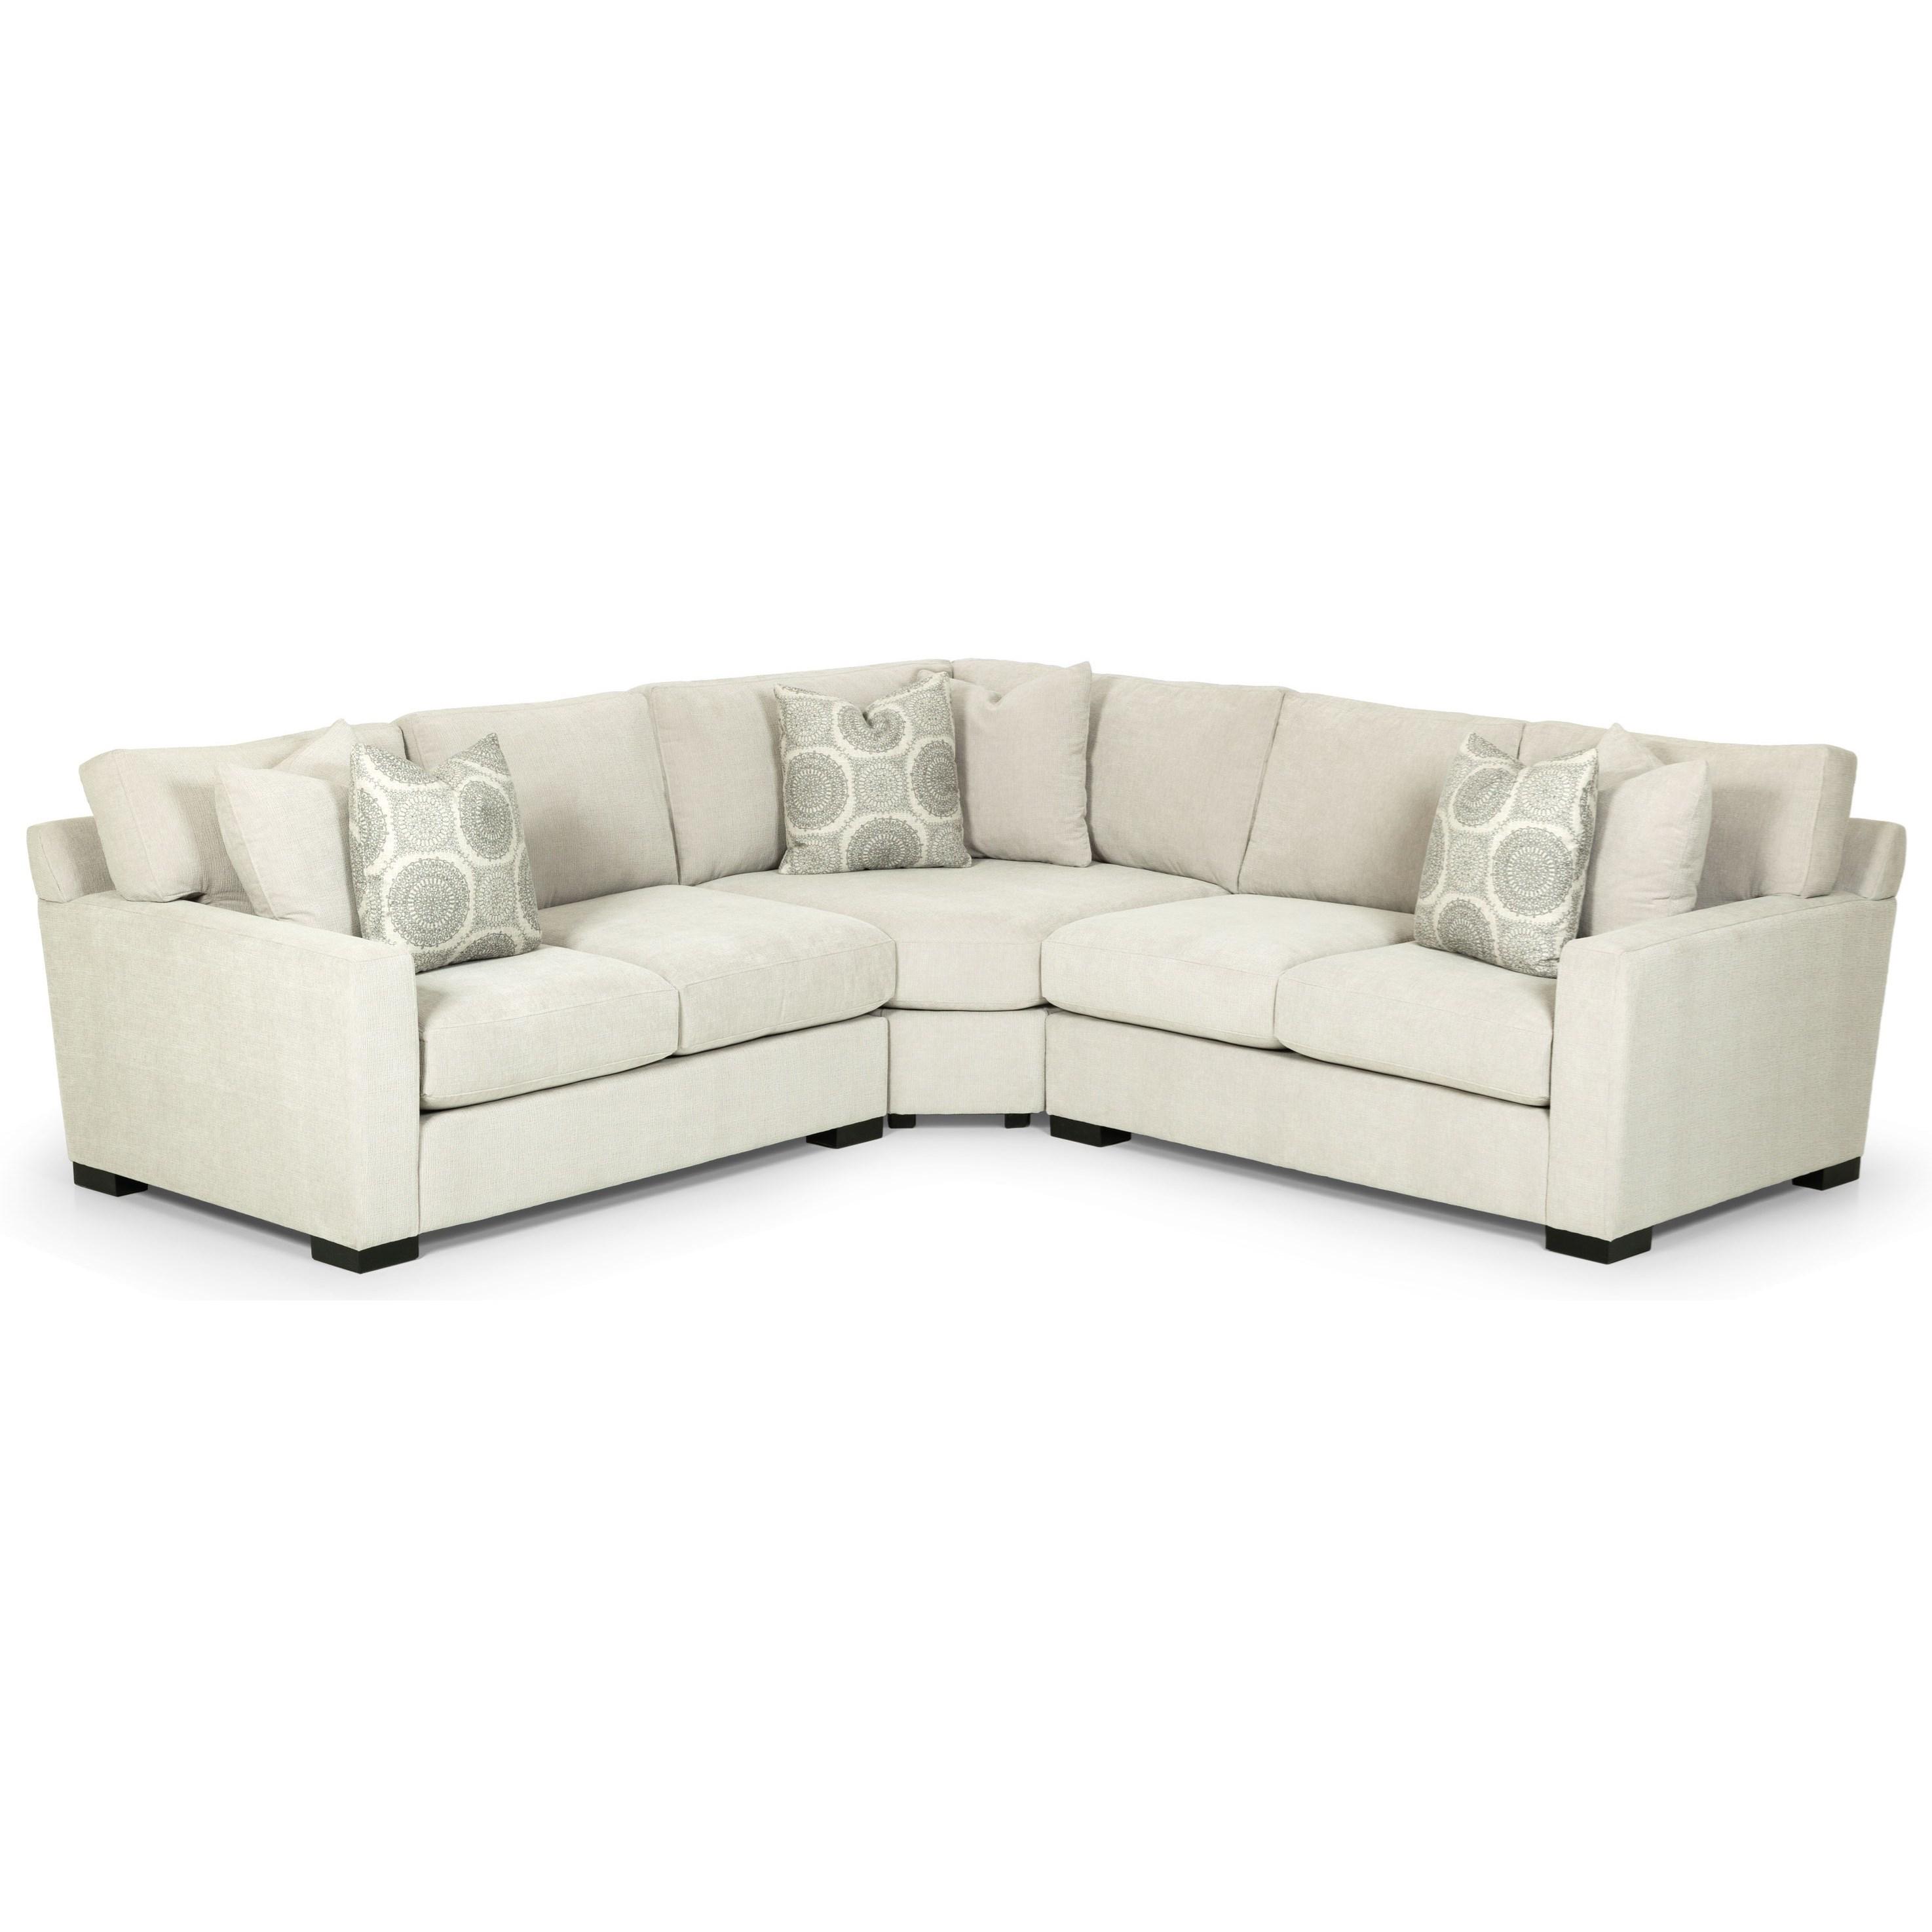 Merveilleux 383 Three Piece Corner Sectional Sofa By Stanton